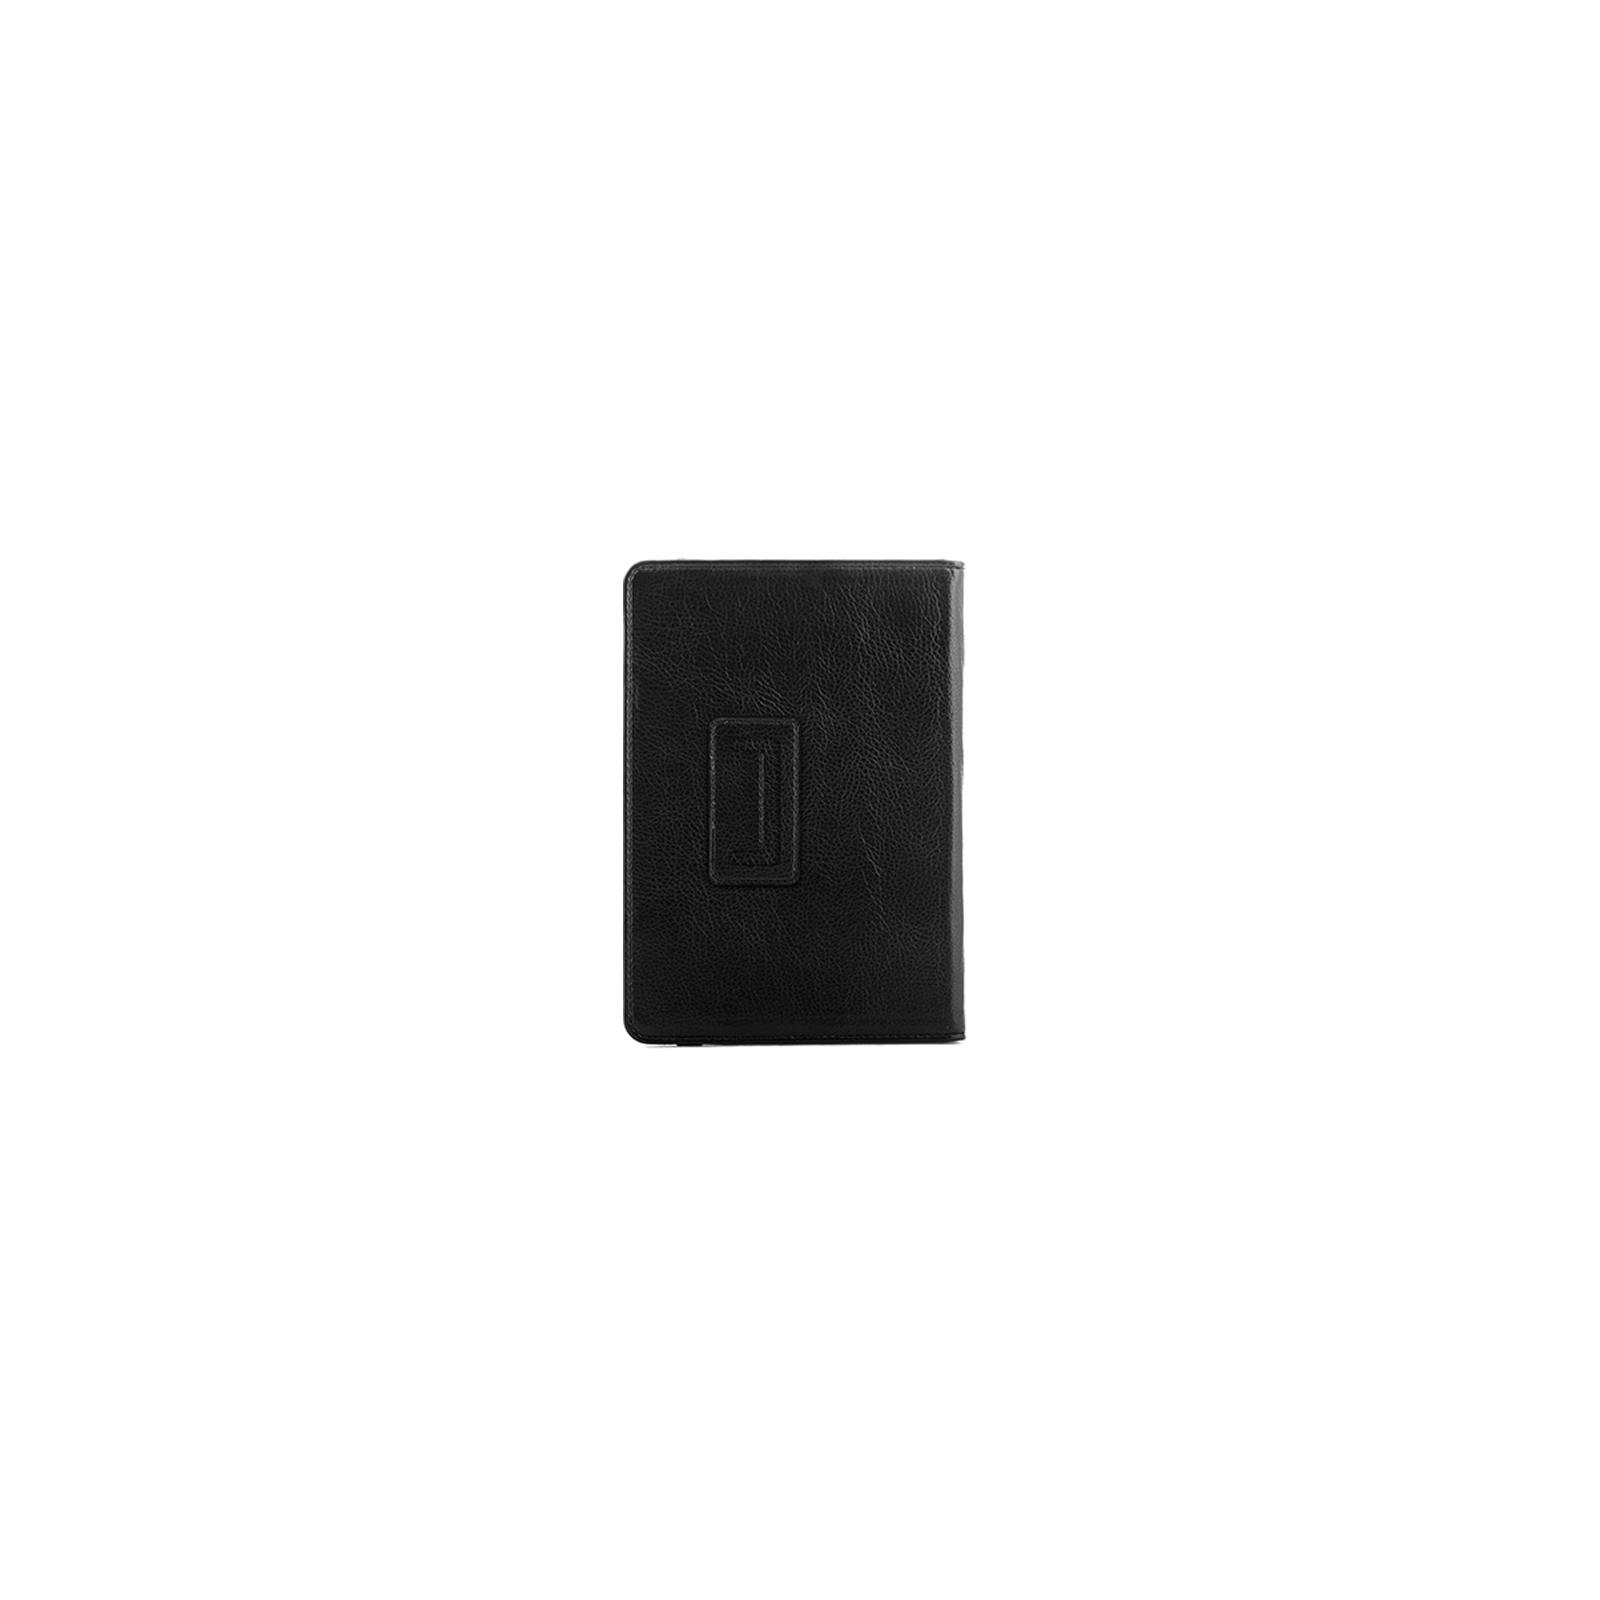 "Чехол для планшета 7"" Cover Stand Black Drobak (216895) изображение 2"